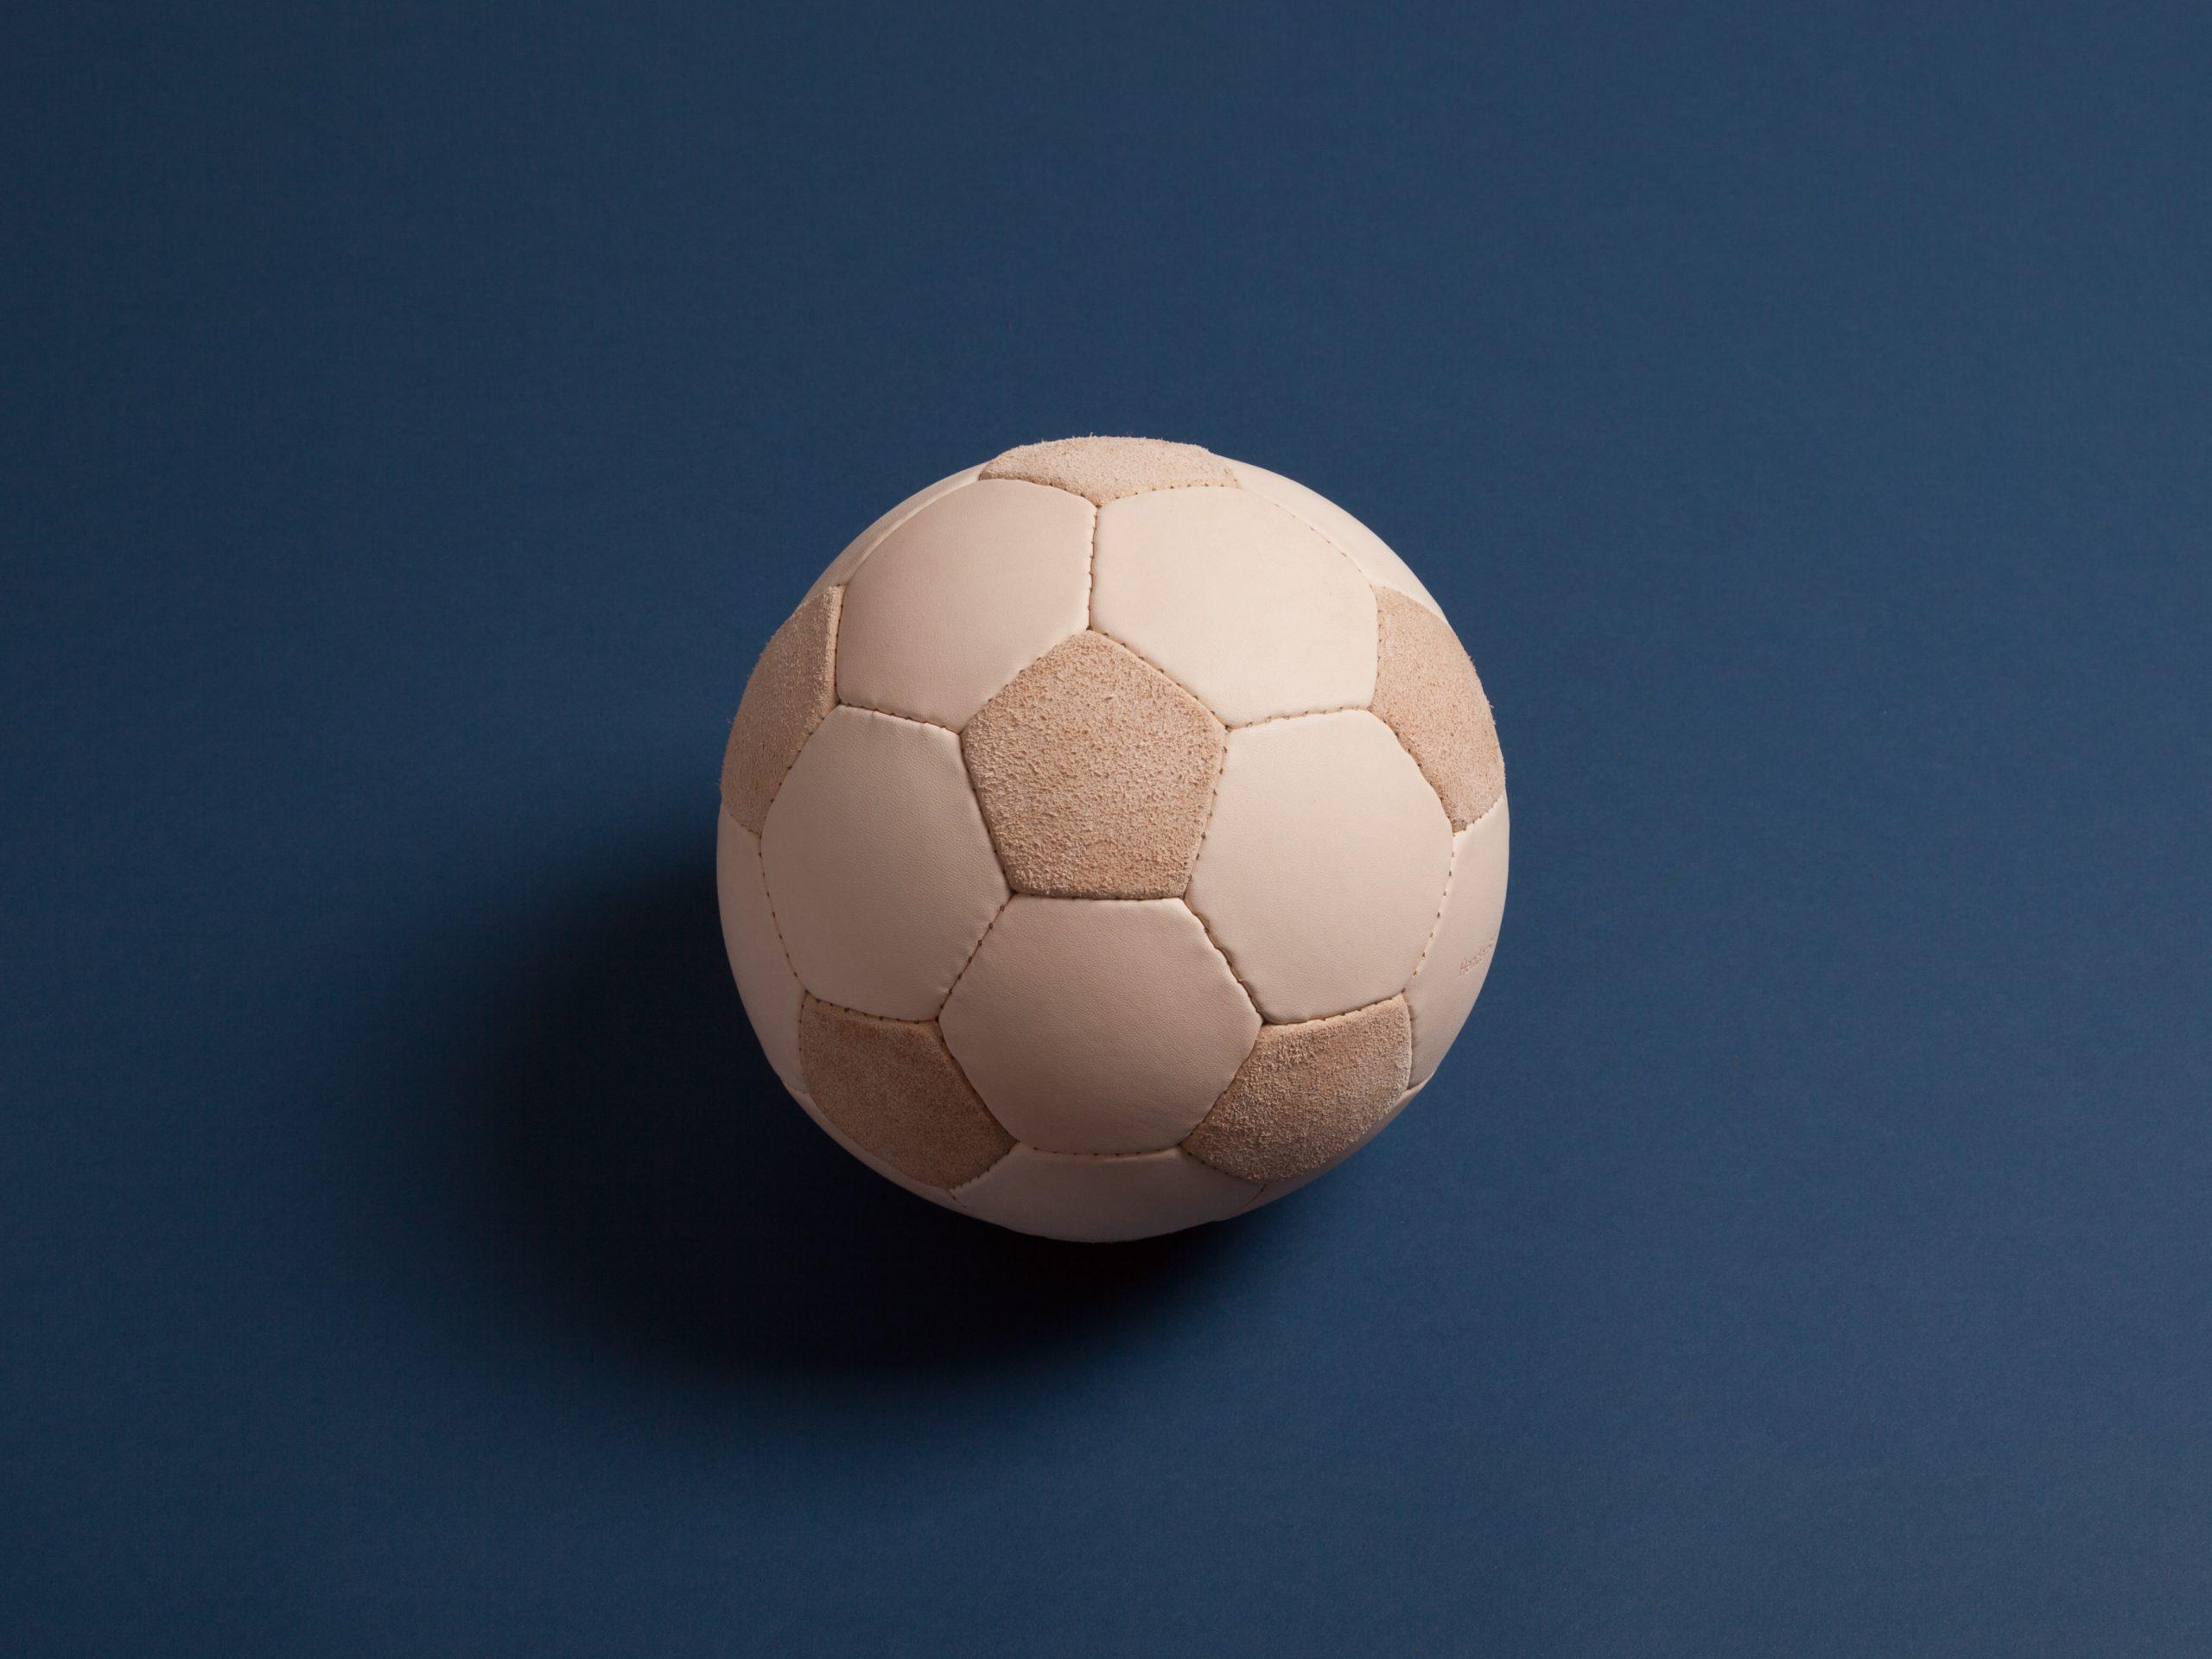 How to Make a Ball